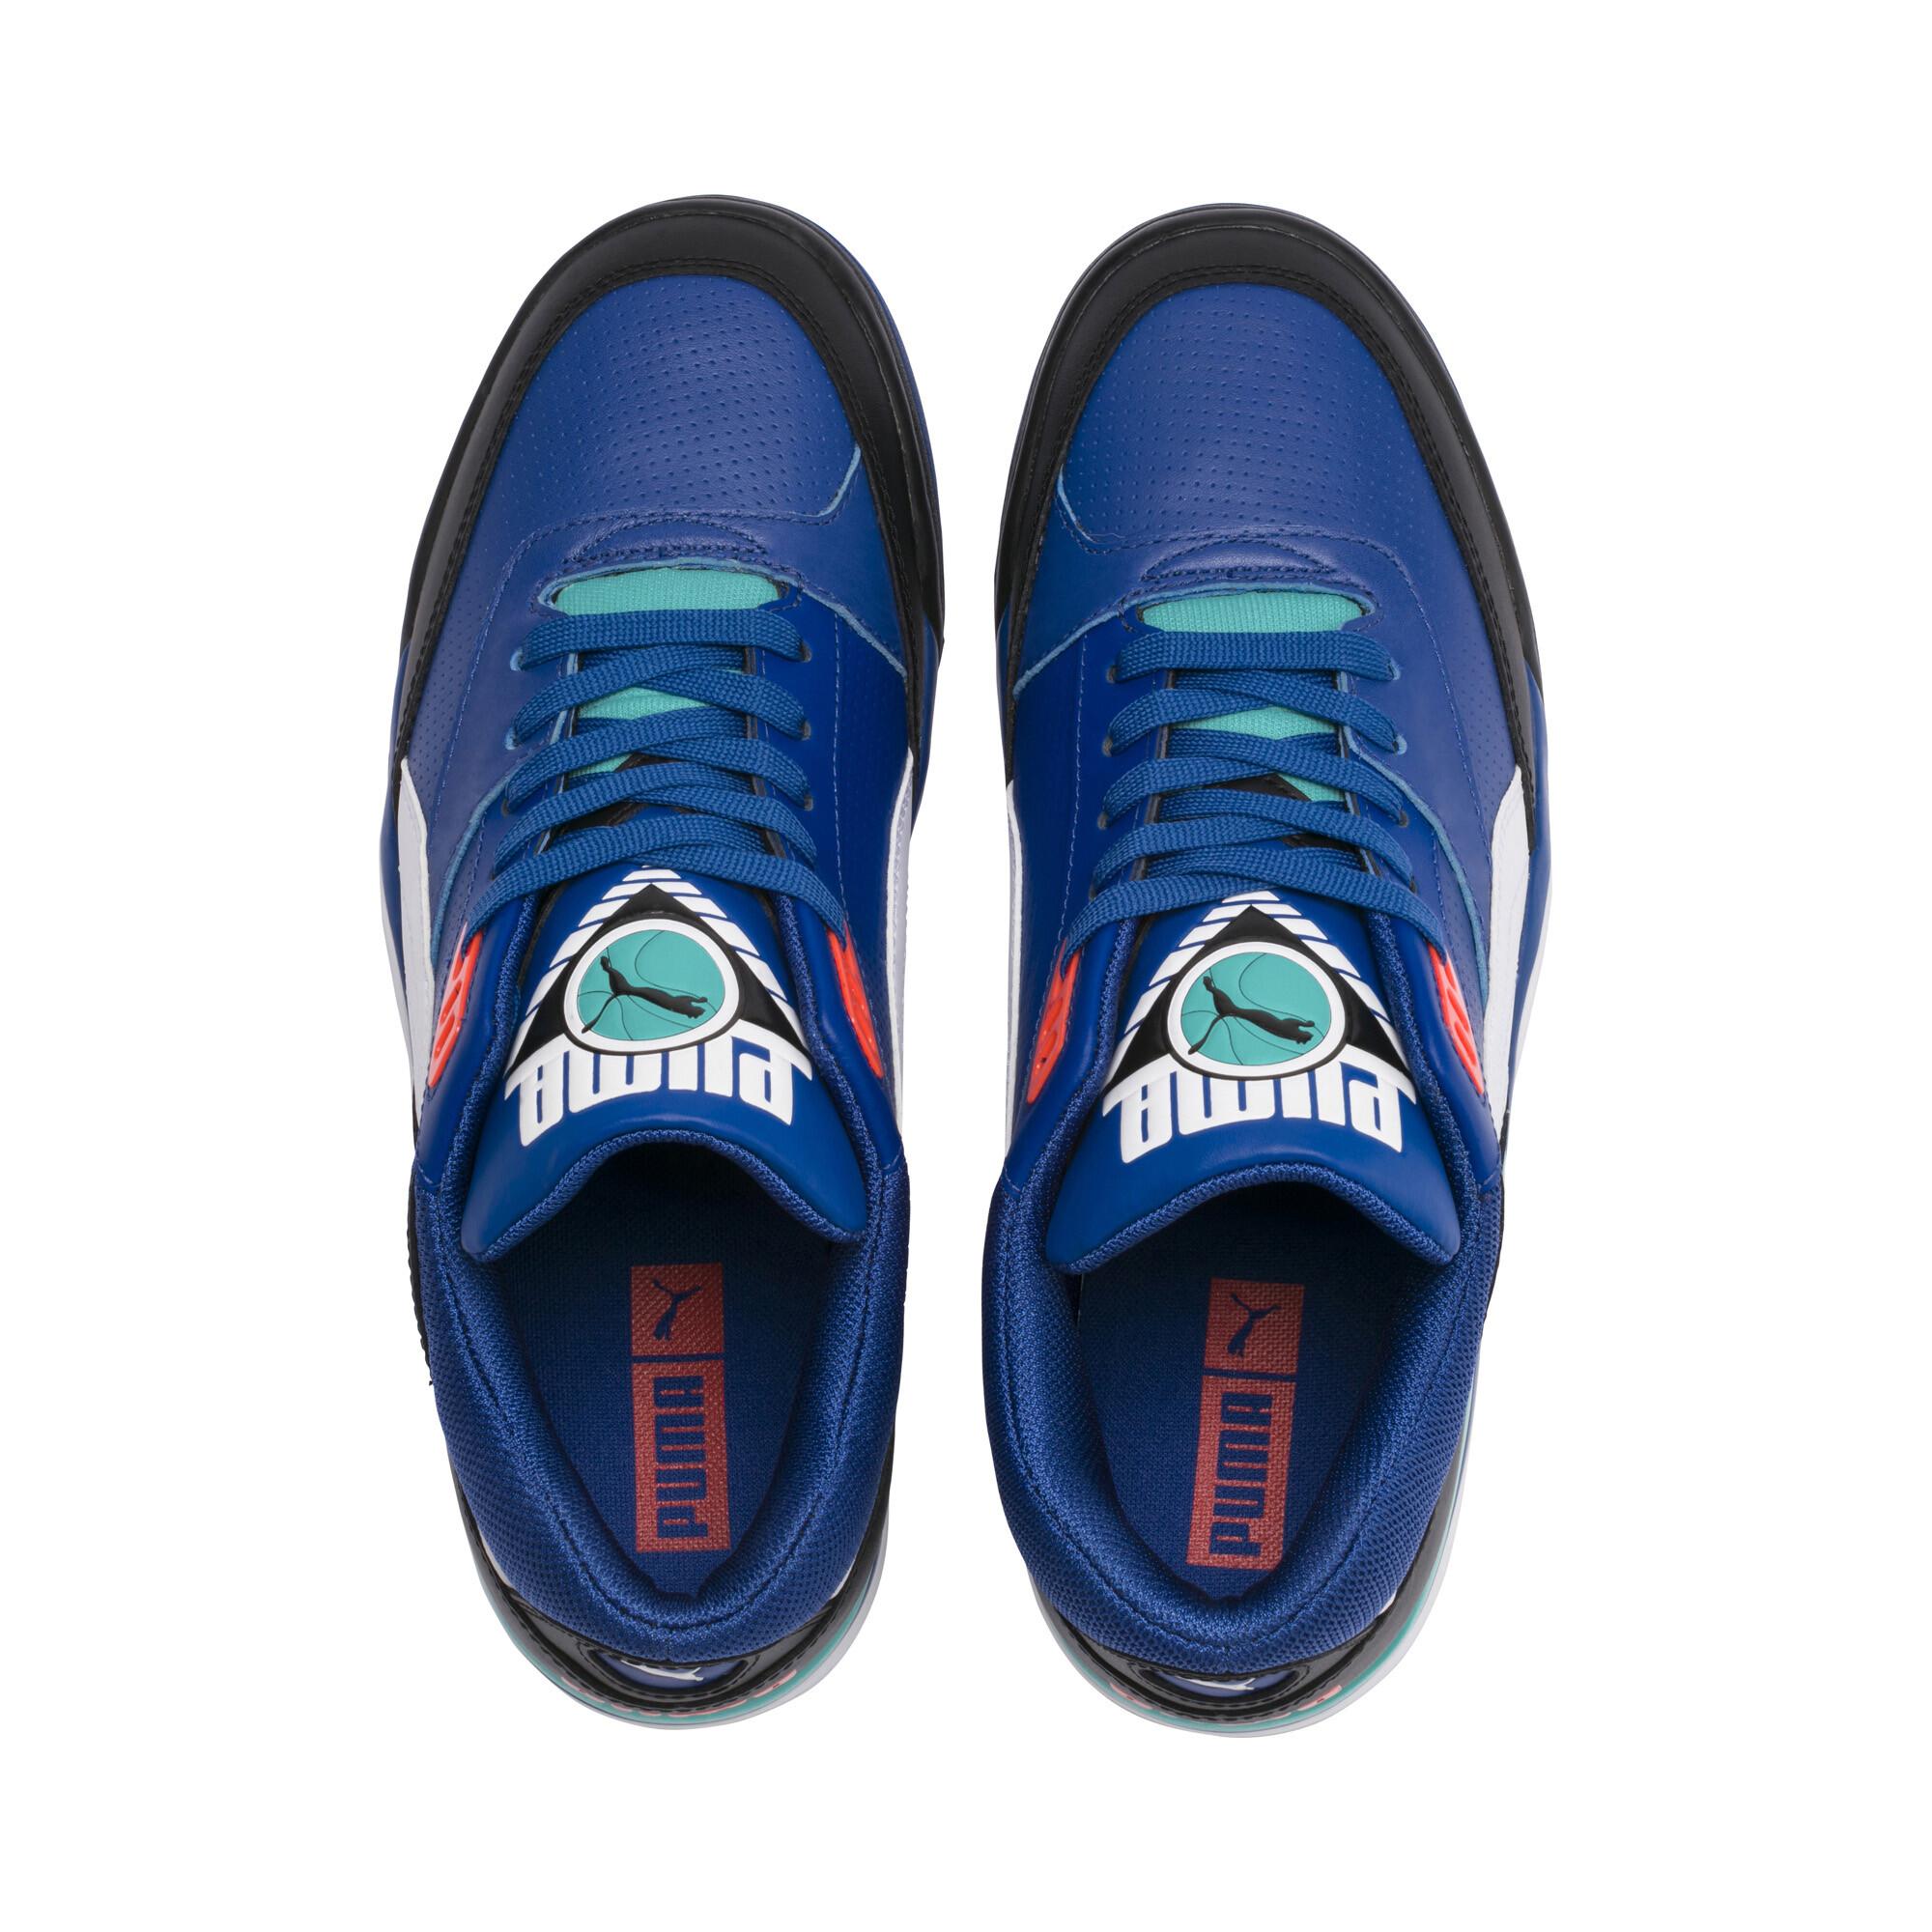 Indexbild 46 - PUMA Palace Guard Sneaker Unisex Schuhe Sport Classics Neu